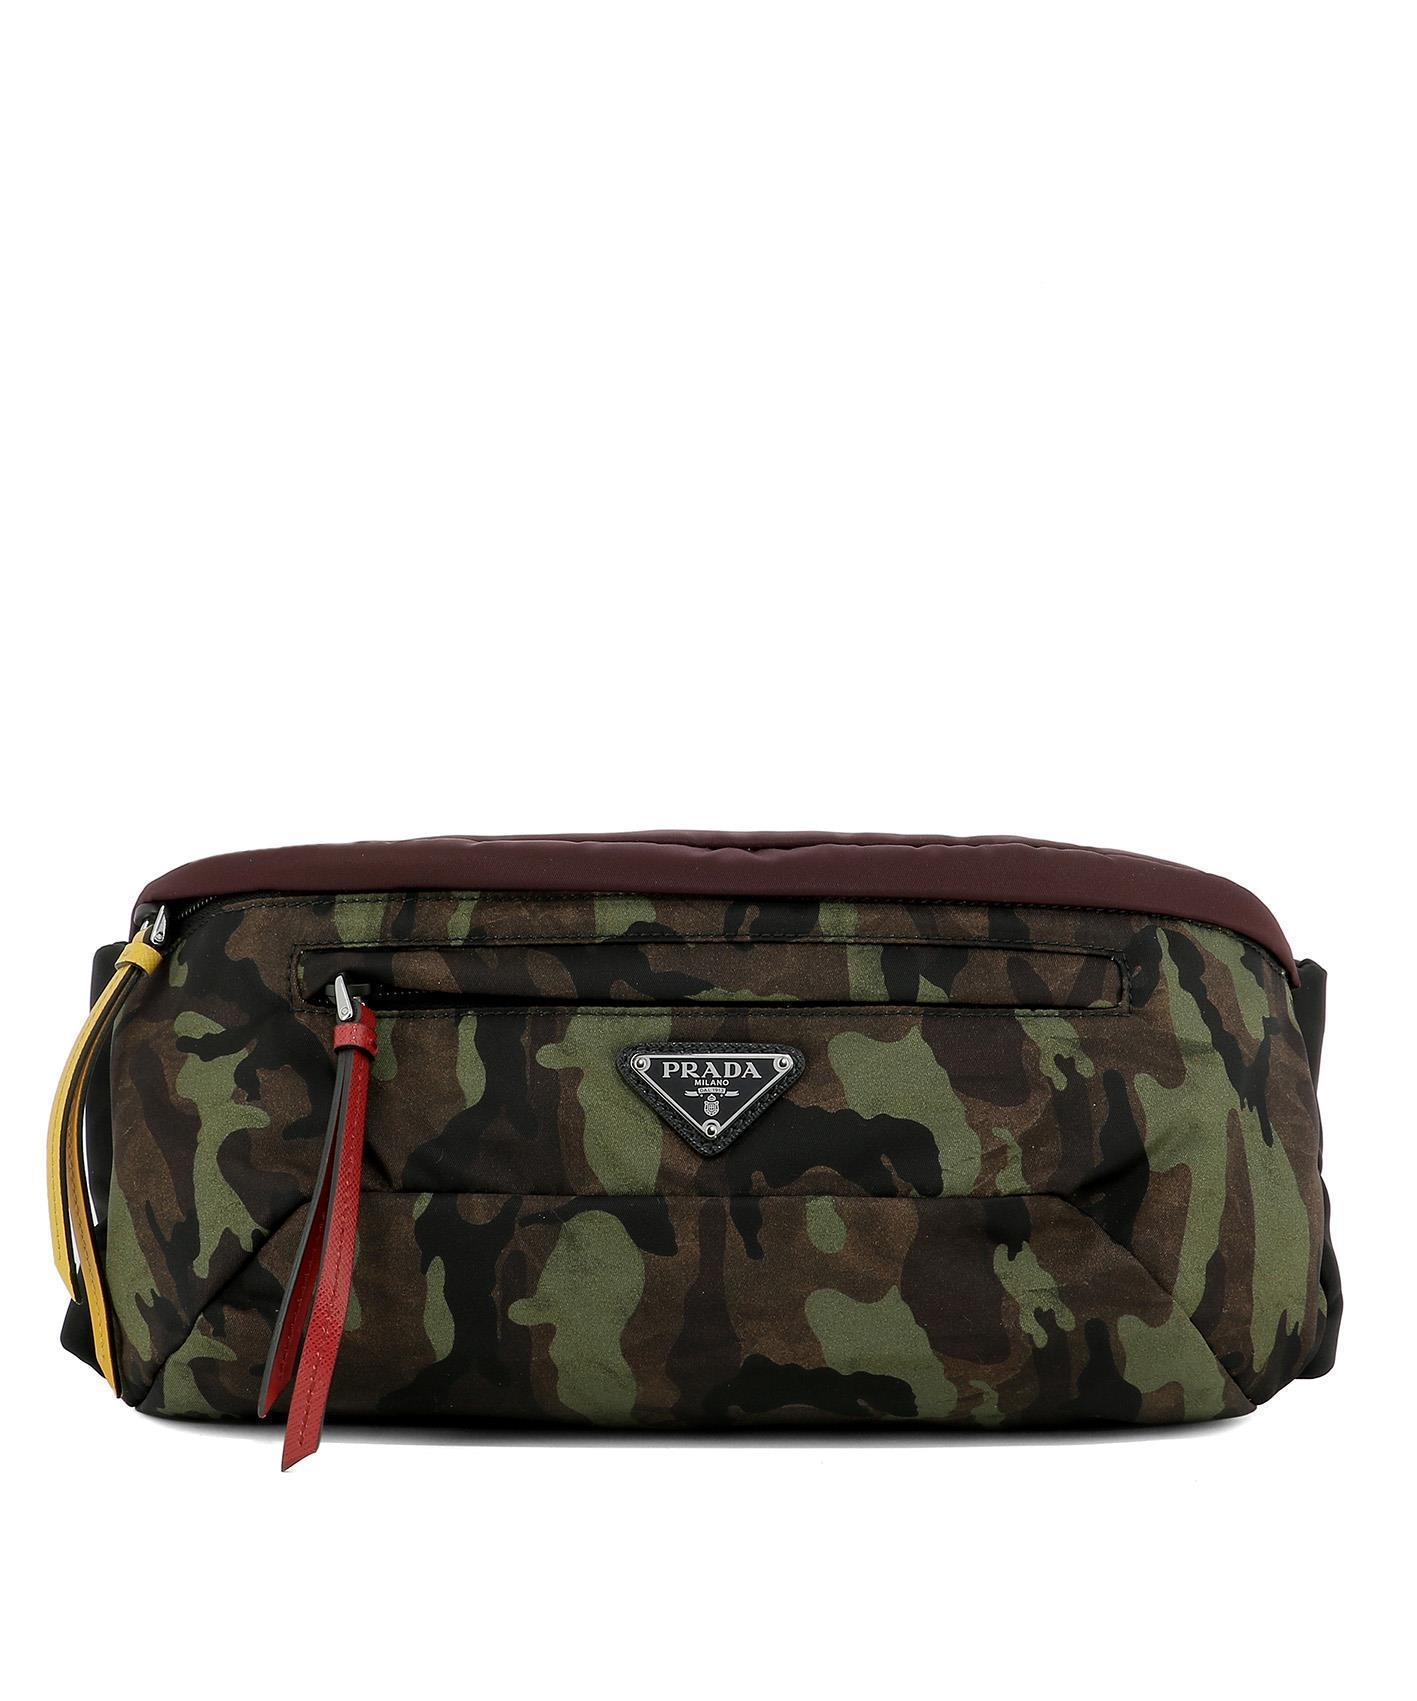 c7df97c145236 ... order prada multicolor montagan camouflage belt bag lyst. view  fullscreen bd9ab 9bf2f